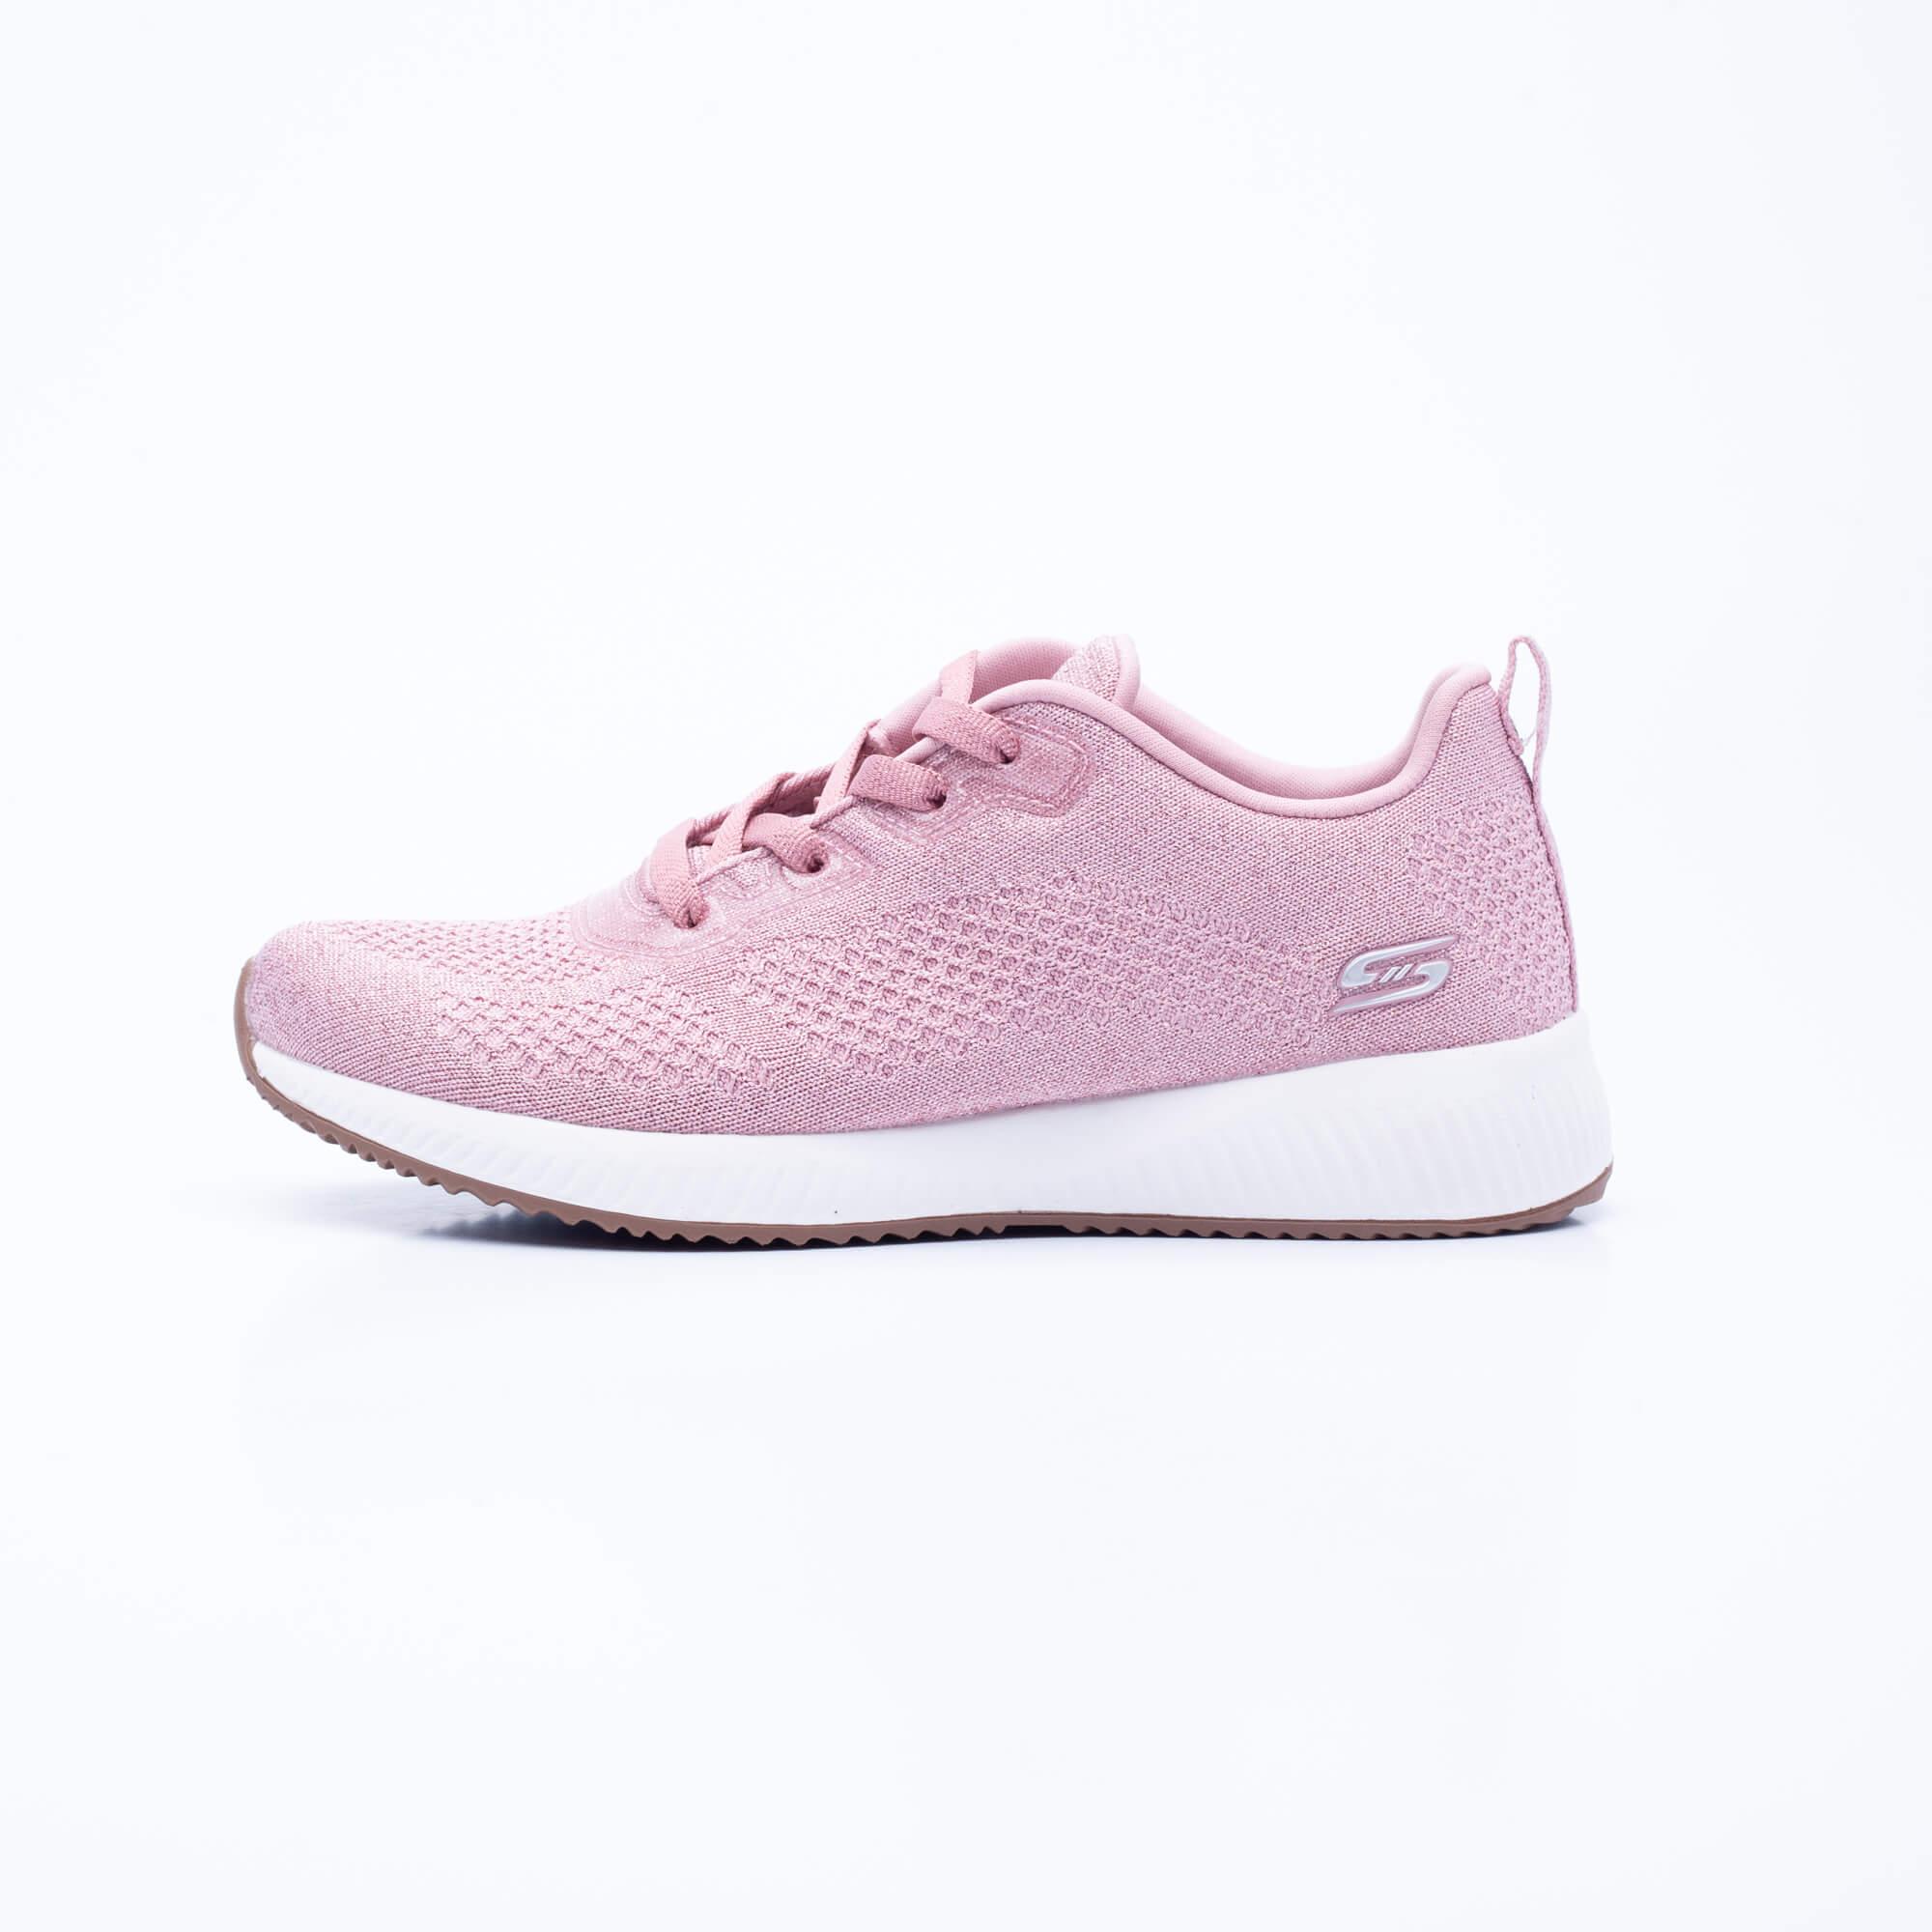 Tenis-Skechers-Mujer-117006PNK